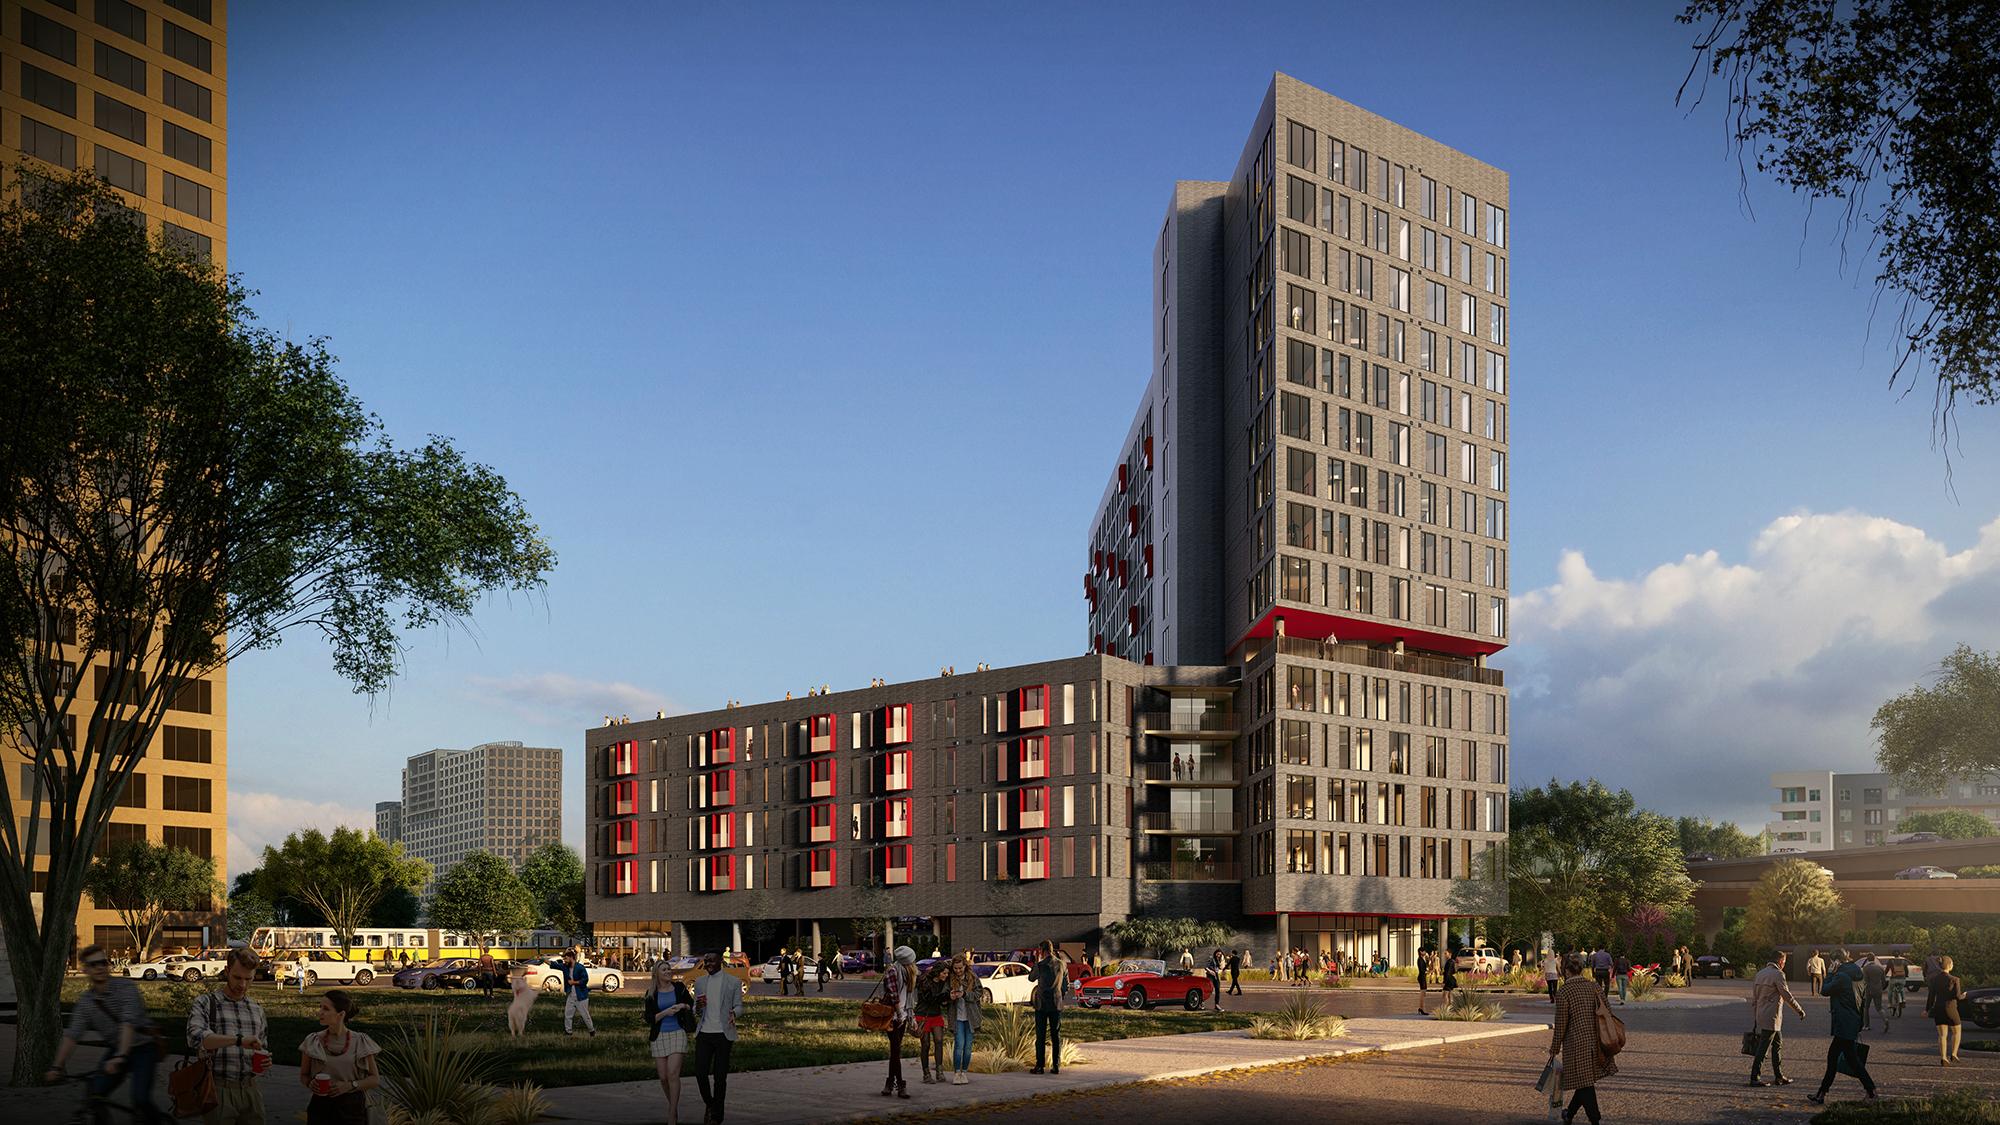 Dallas, TX | 245,000 SF 15-story Residential Tower; 148,000 SF 7-story Retail/Garage | 2019